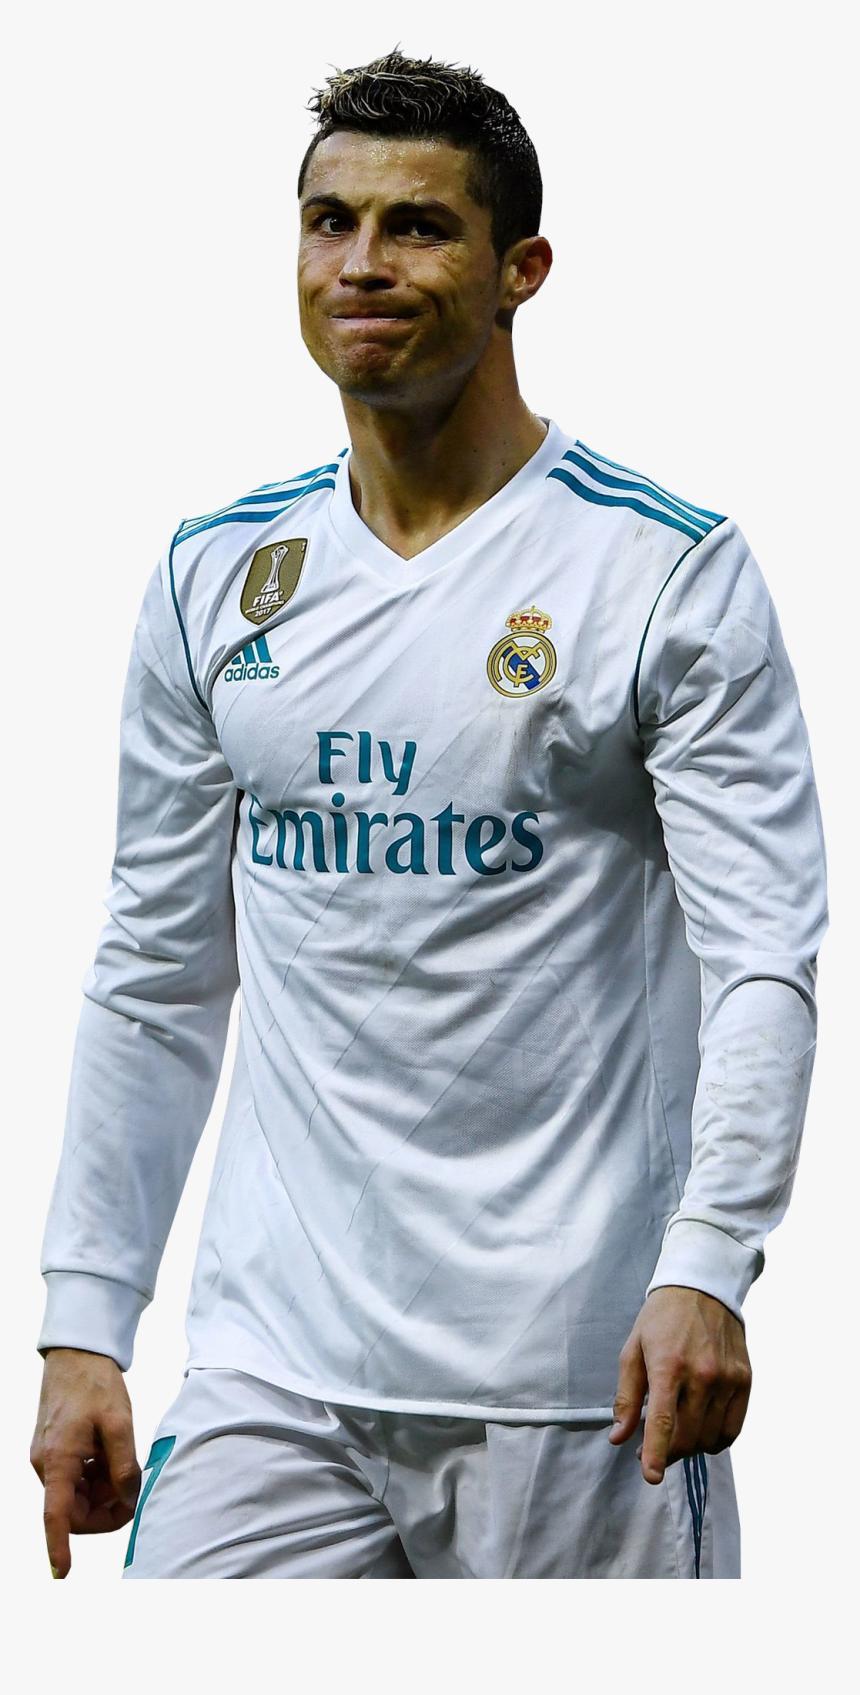 Cristiano Ronaldo Cr7 Png 2018 Football Clipart Image